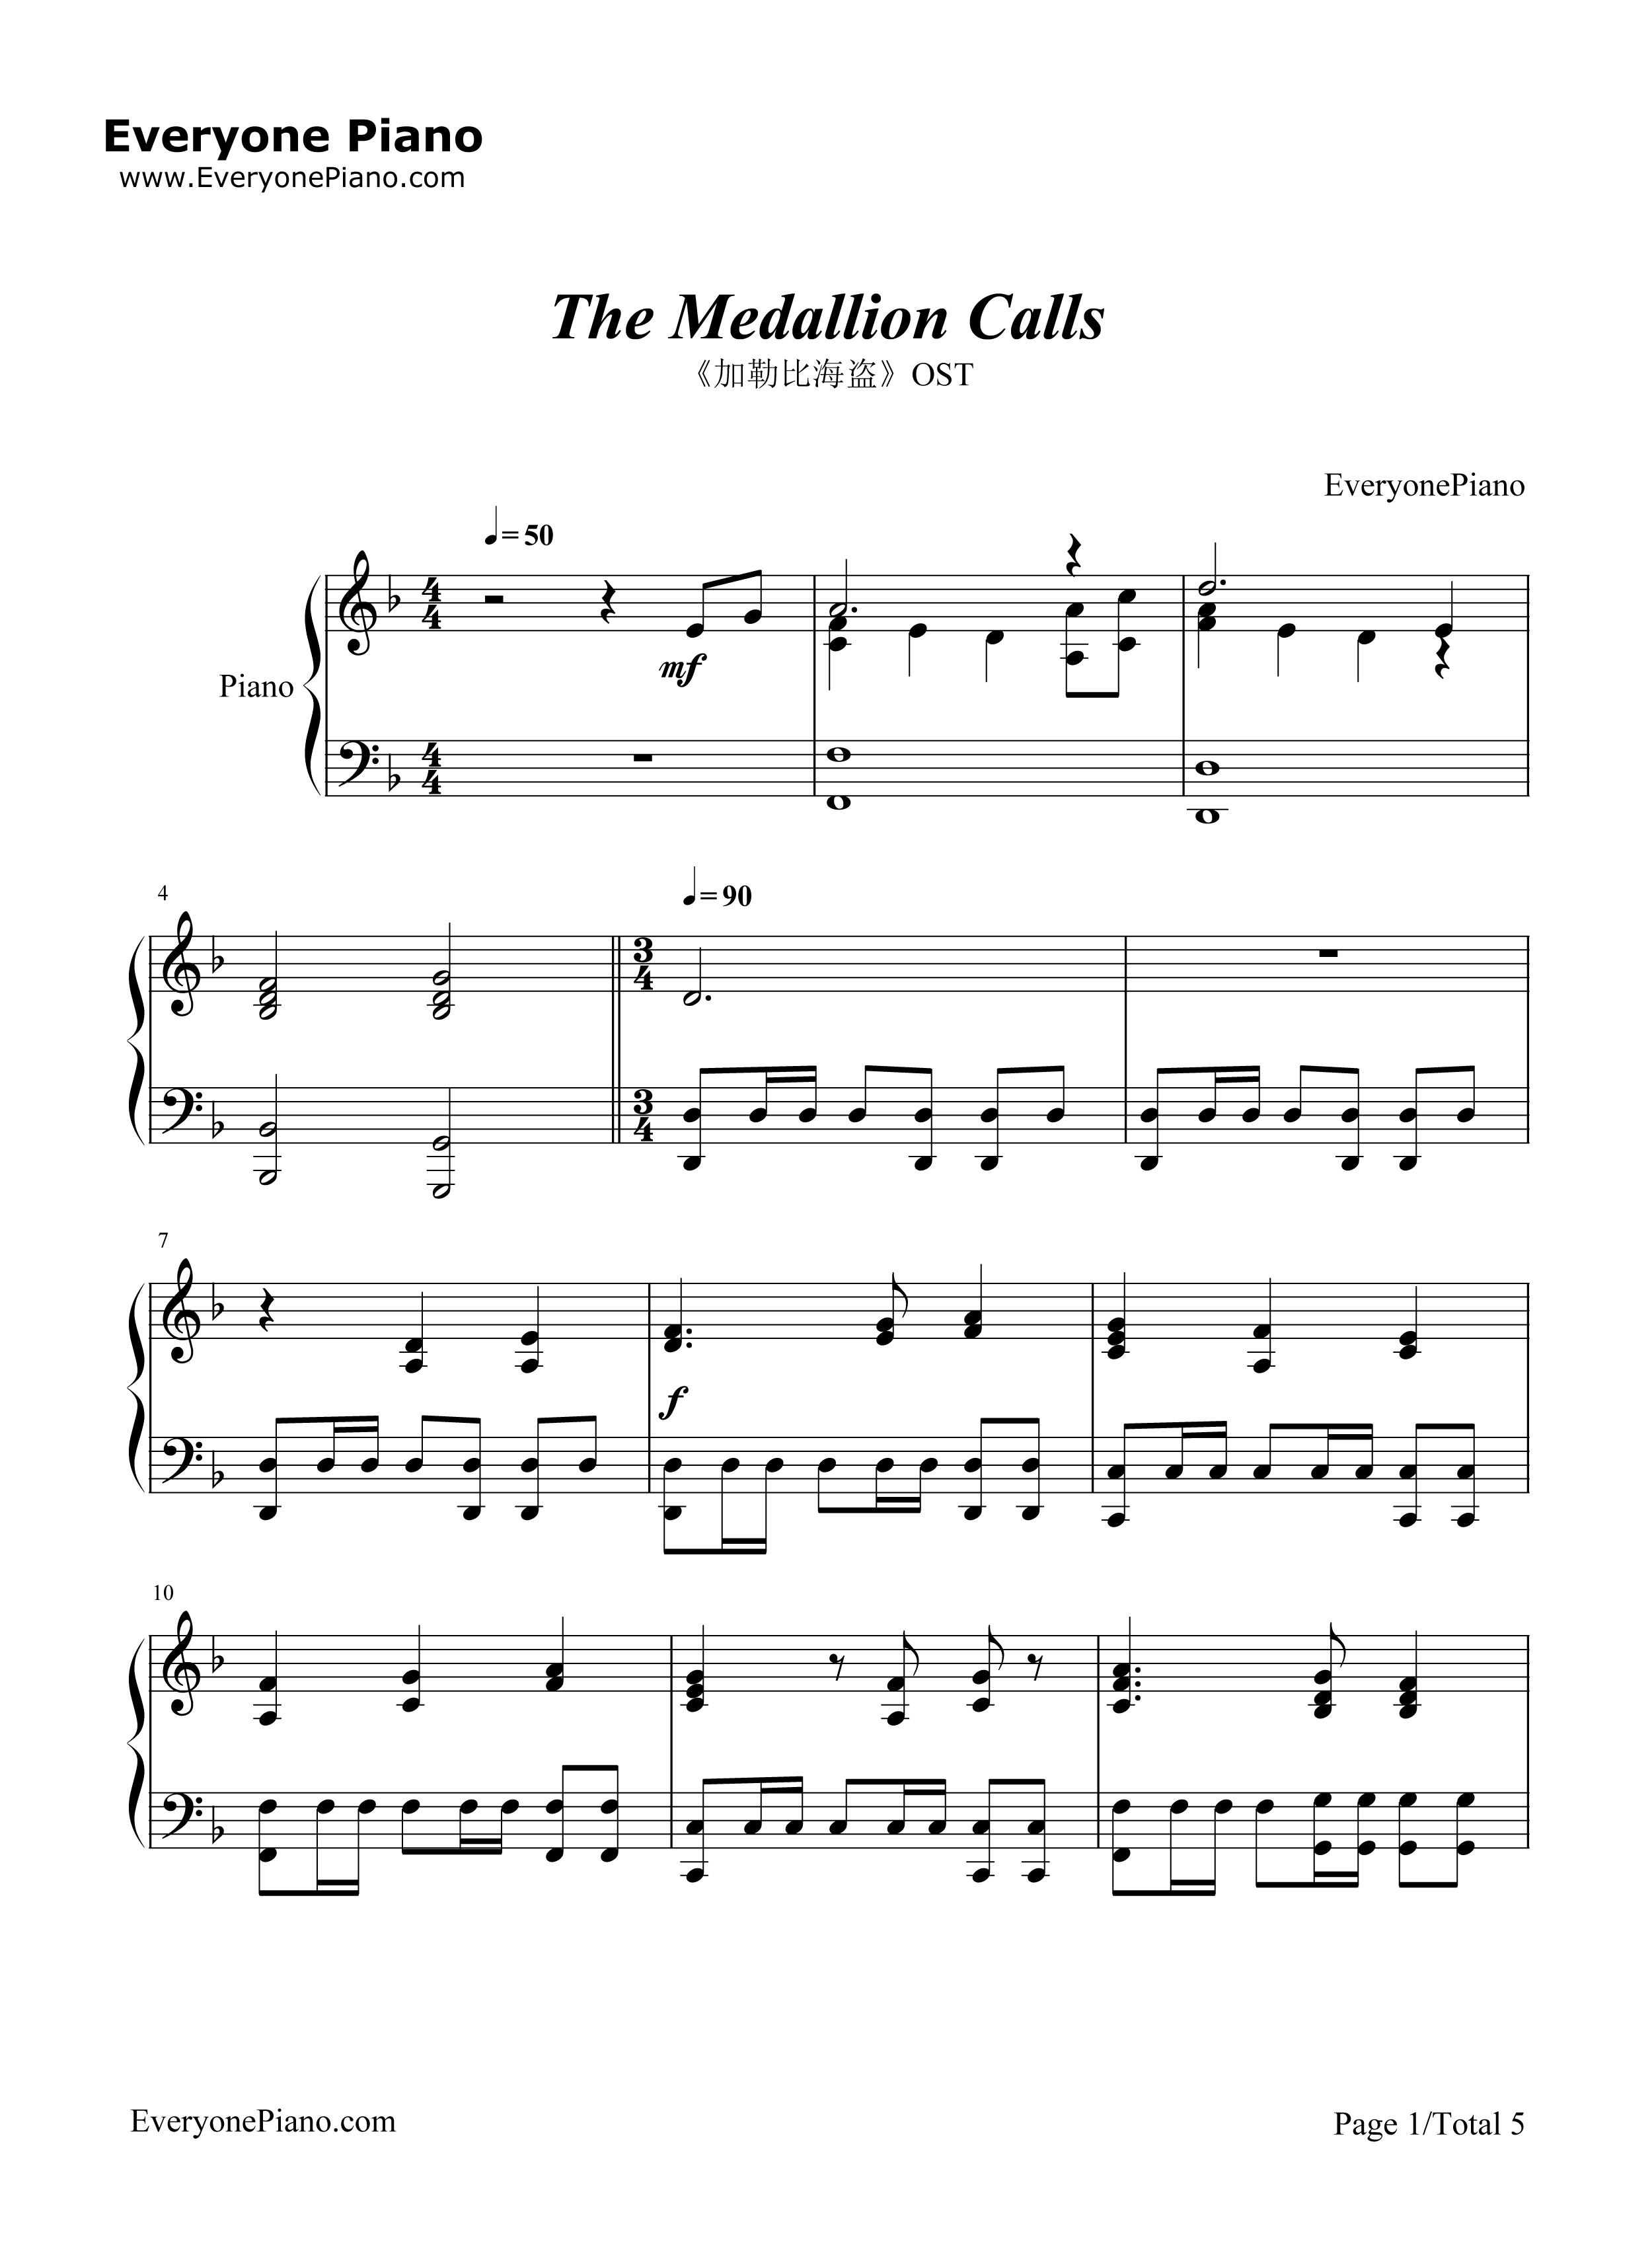 lion乐谱-The Medallion Calls 加勒比海盗 OST五线谱预览1